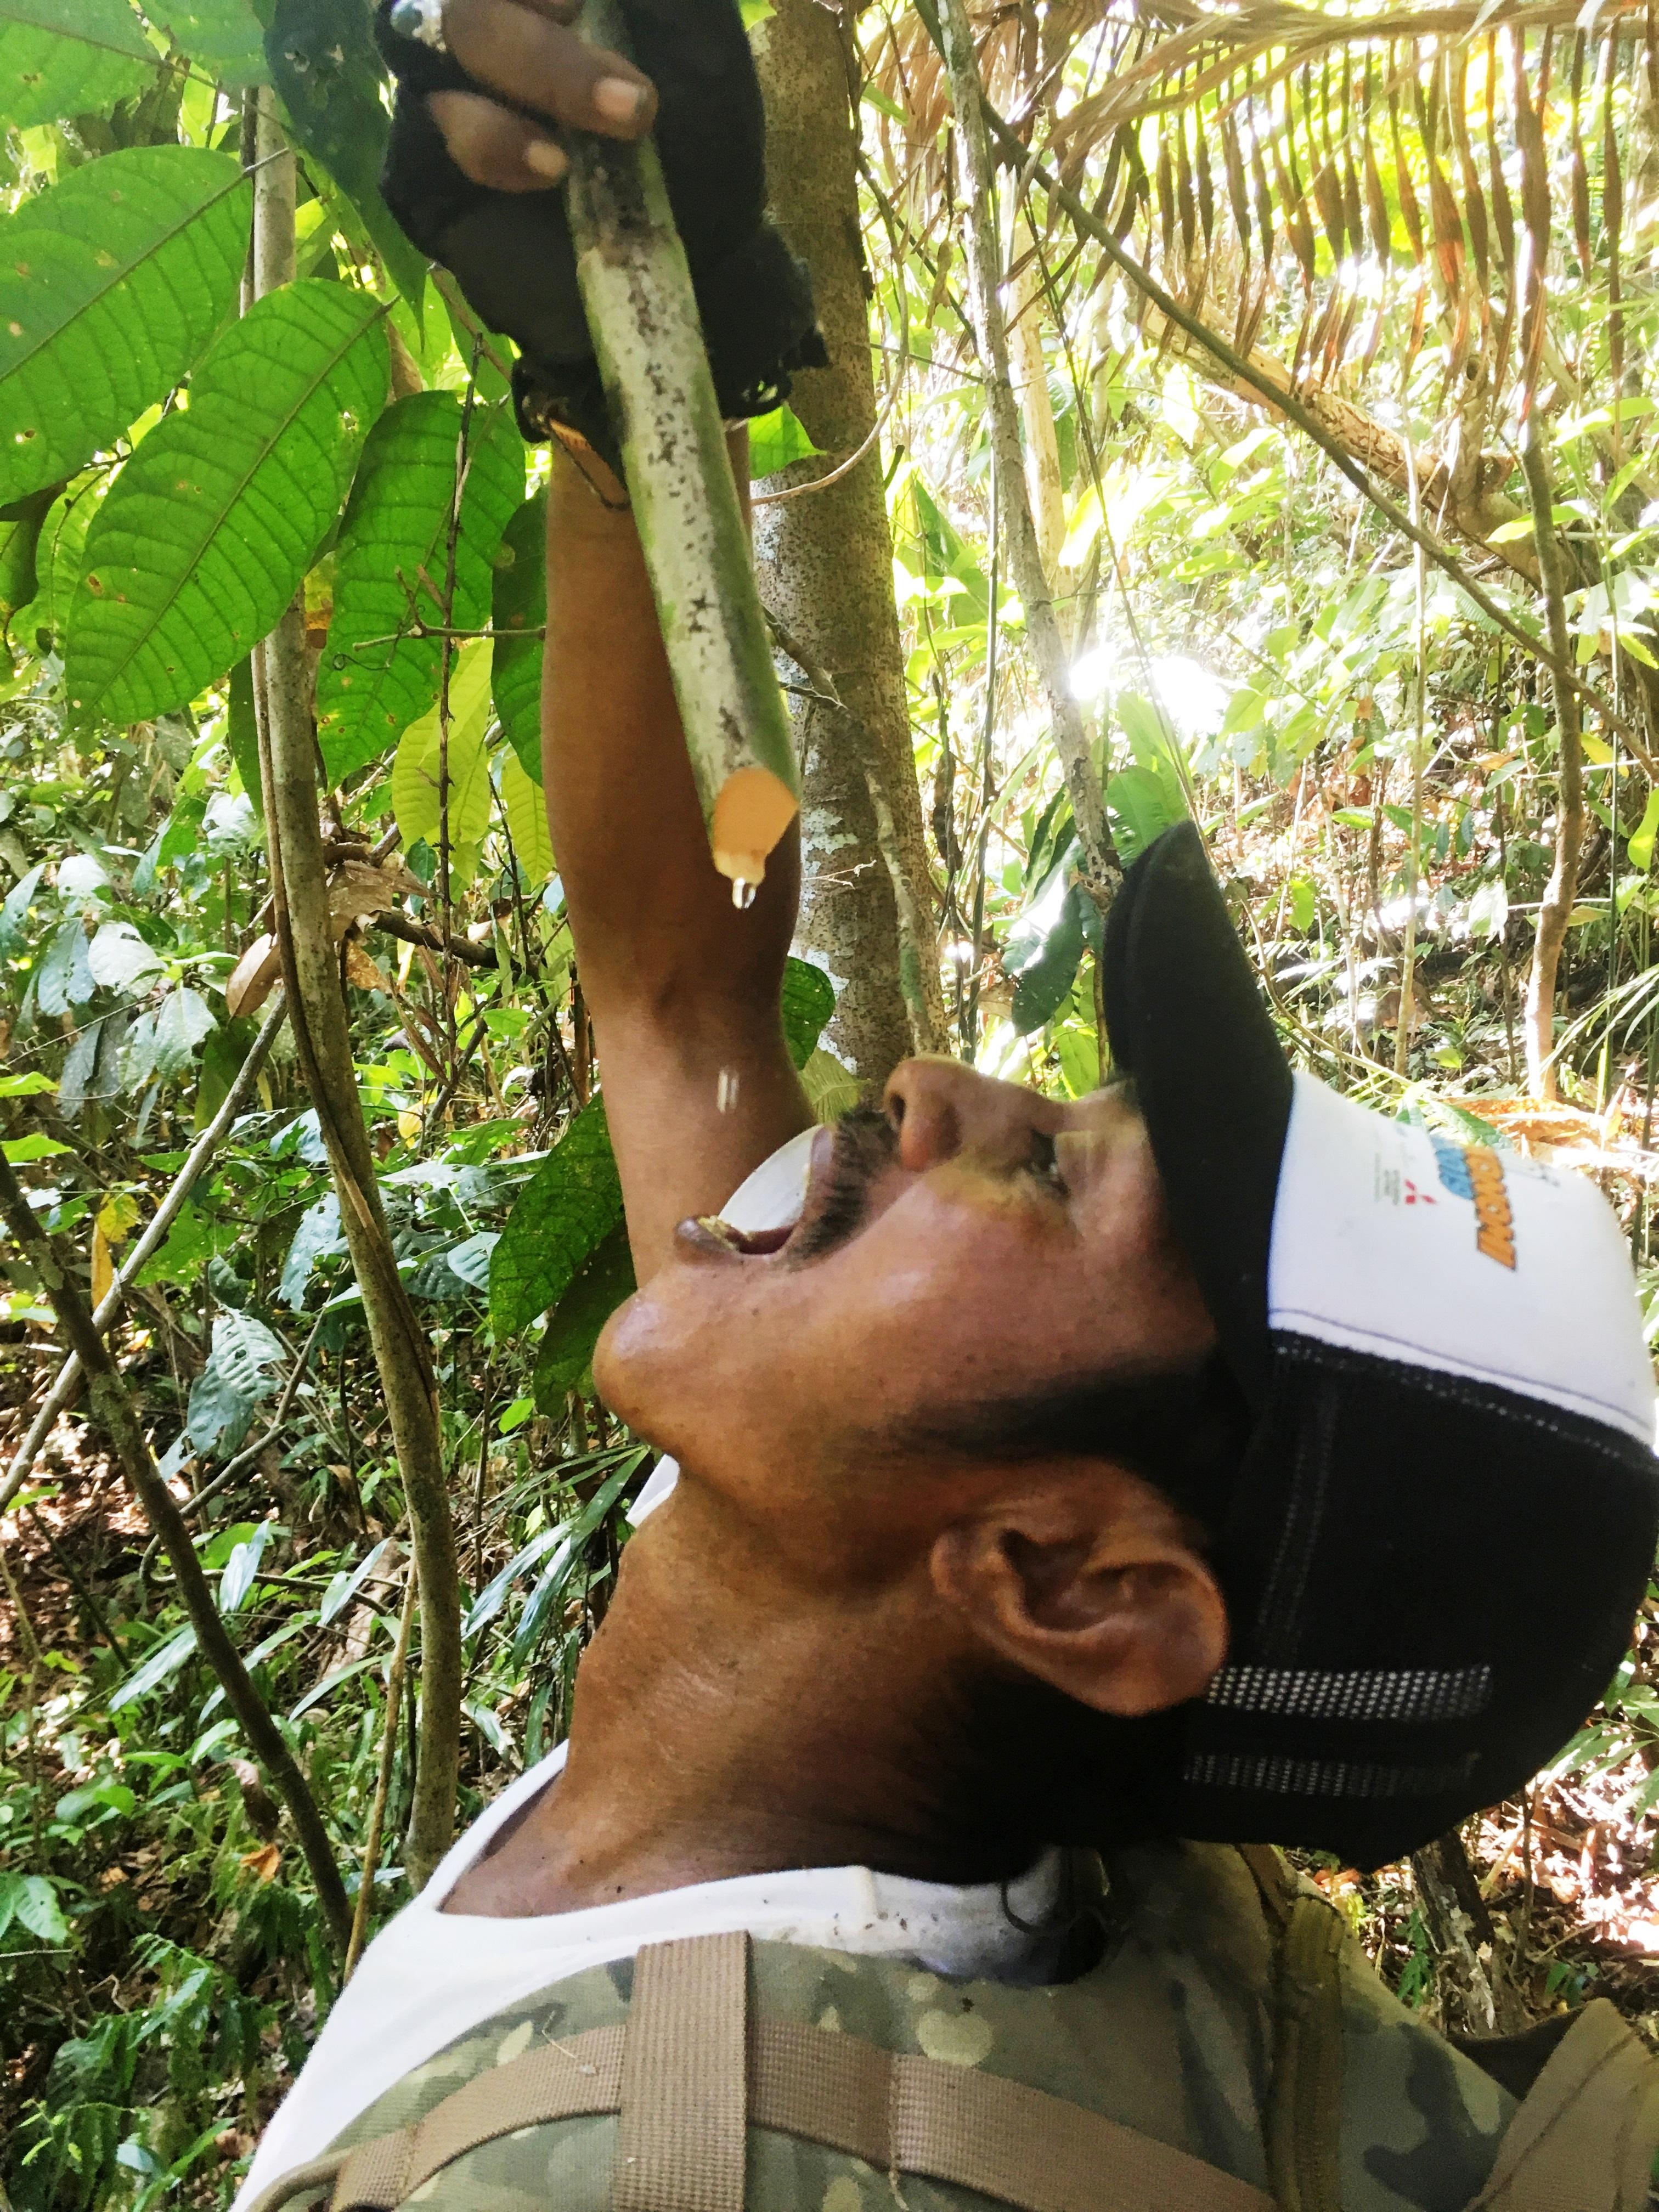 Gunung-Sabatai-Jungle-survival-–-water-from-rattan-vine-Nick-Hughes-September-2019